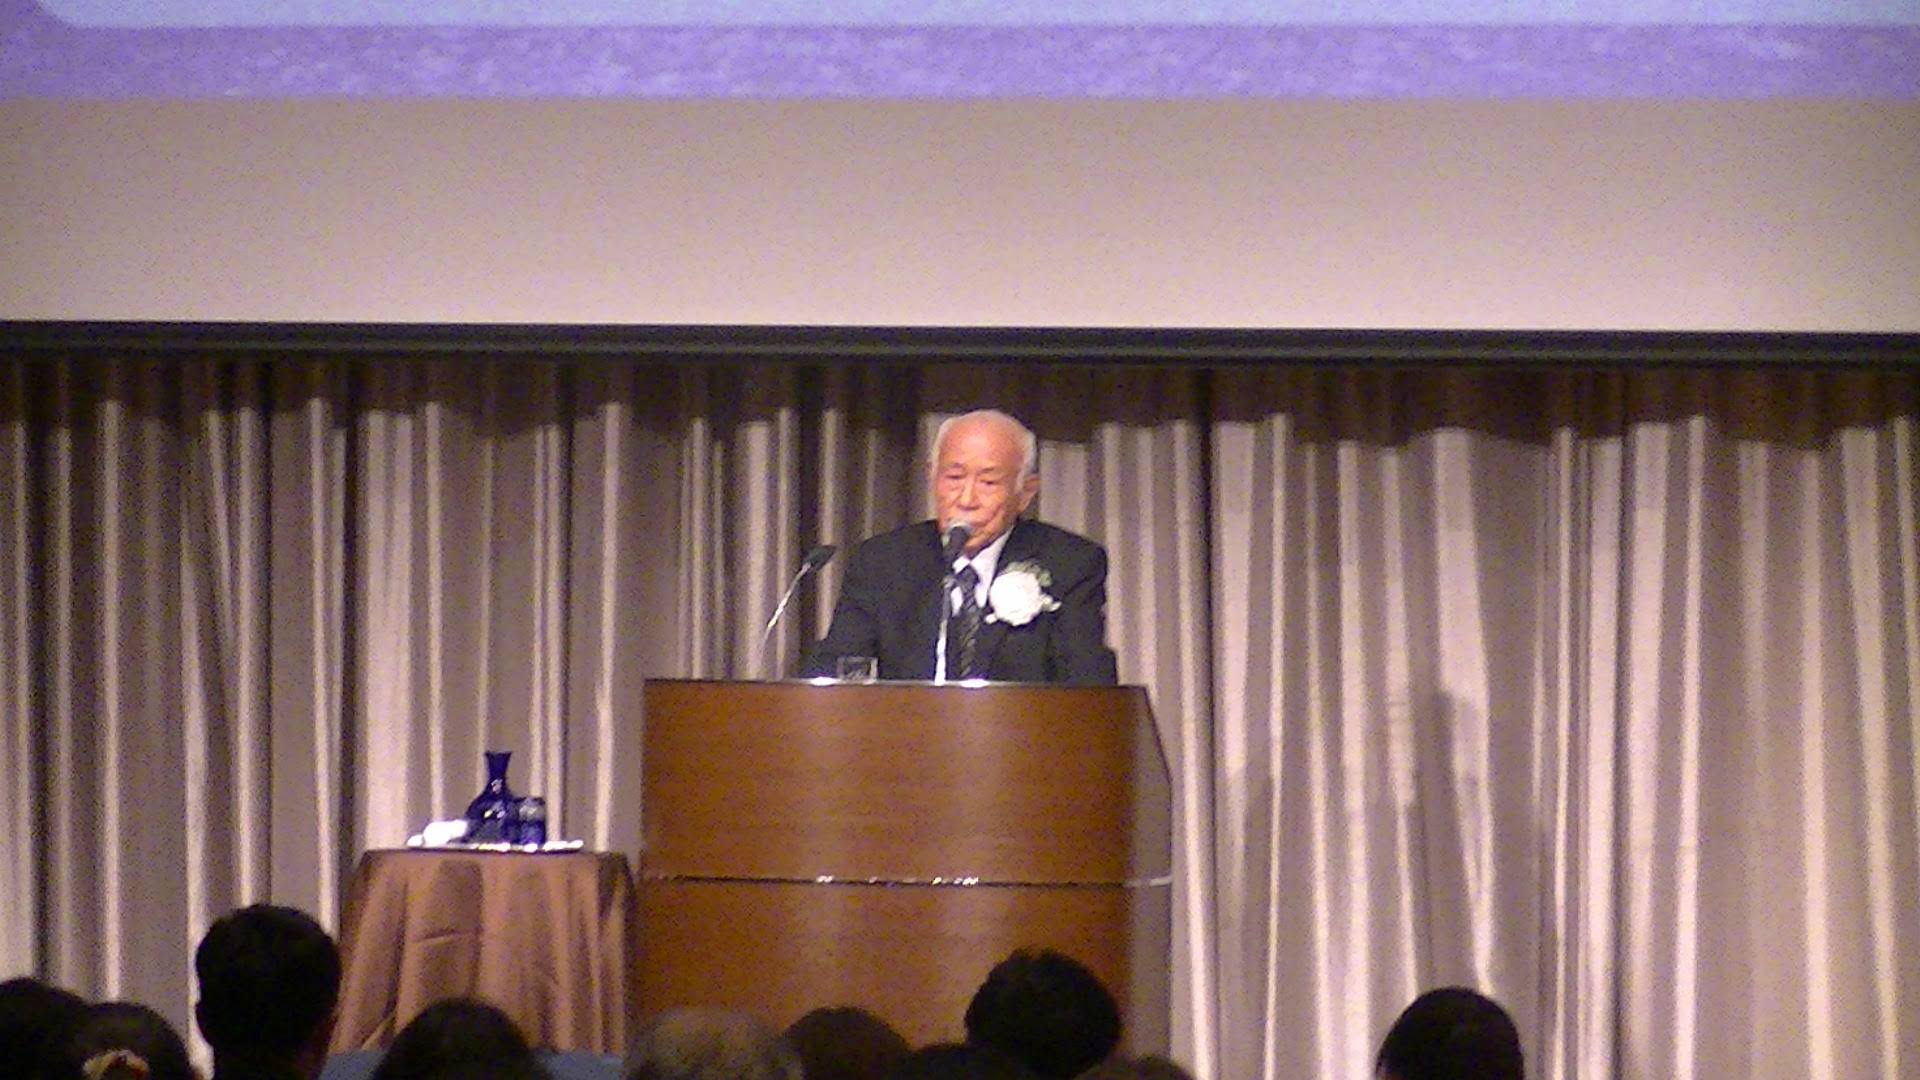 PIC 1644 1 - 思風会全国大会in広島